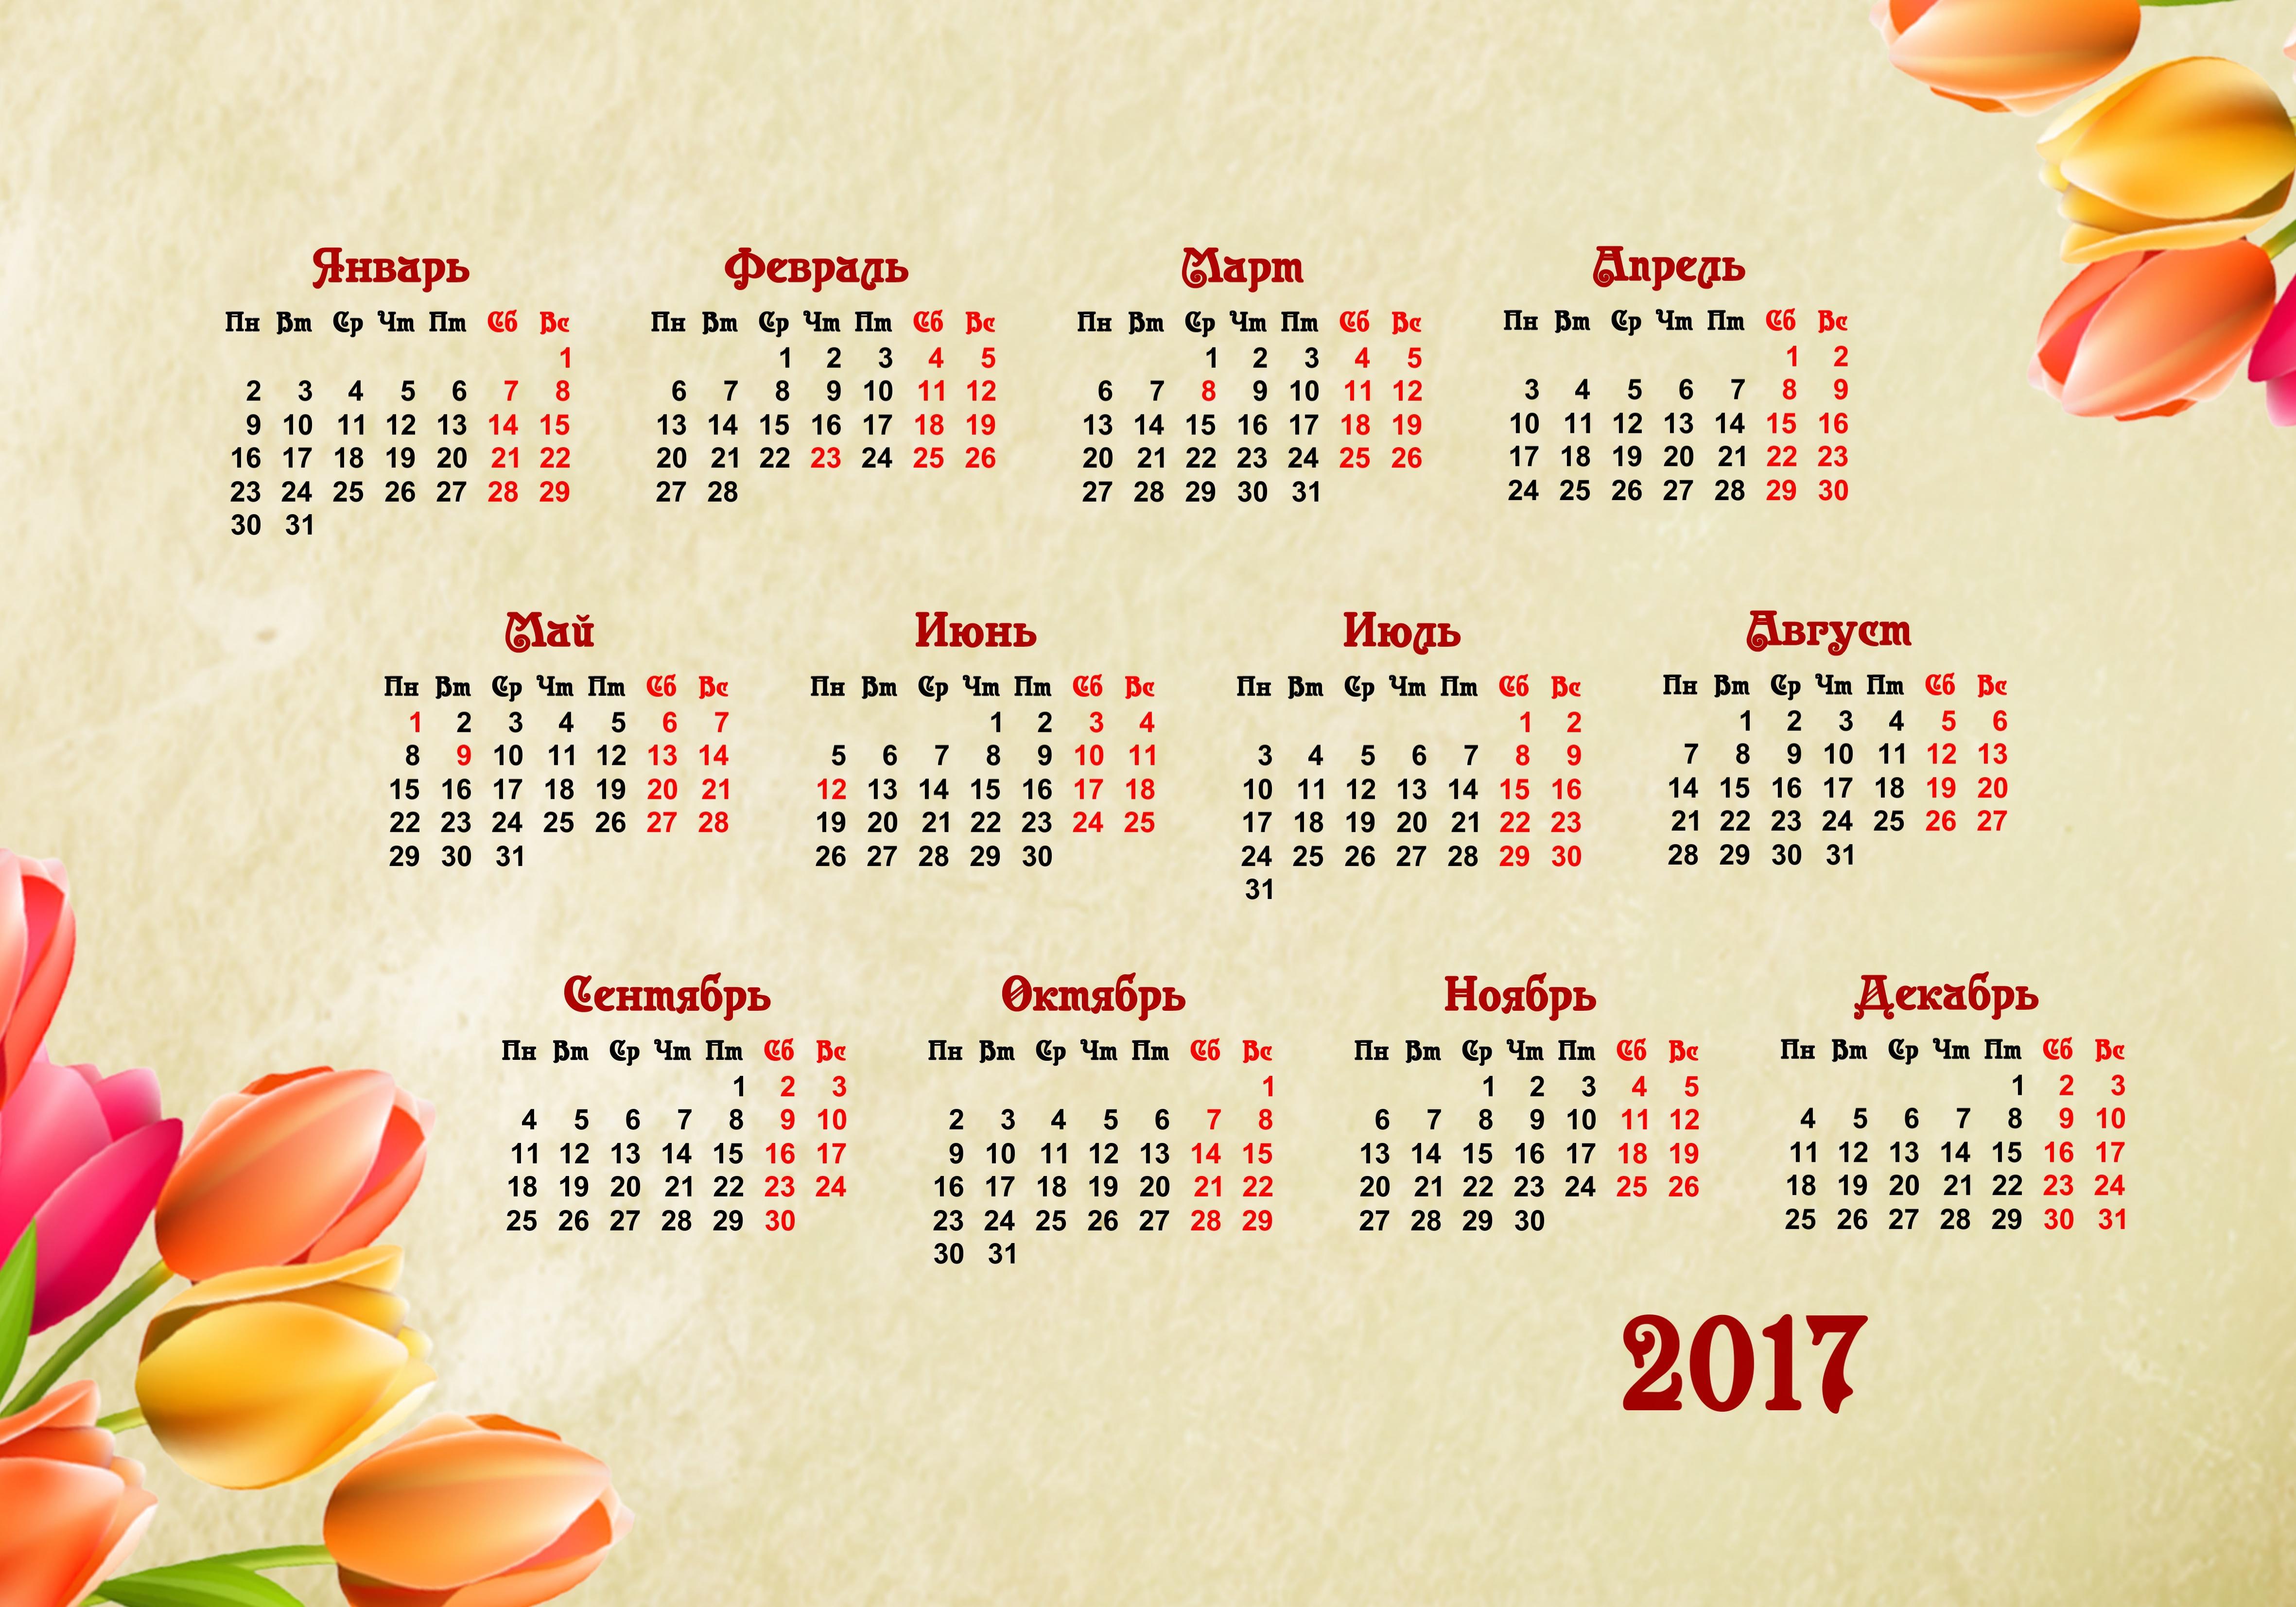 обои календарь на 2017 год, 2017, год петуха, календарная сетка на 2017 год картинки фото